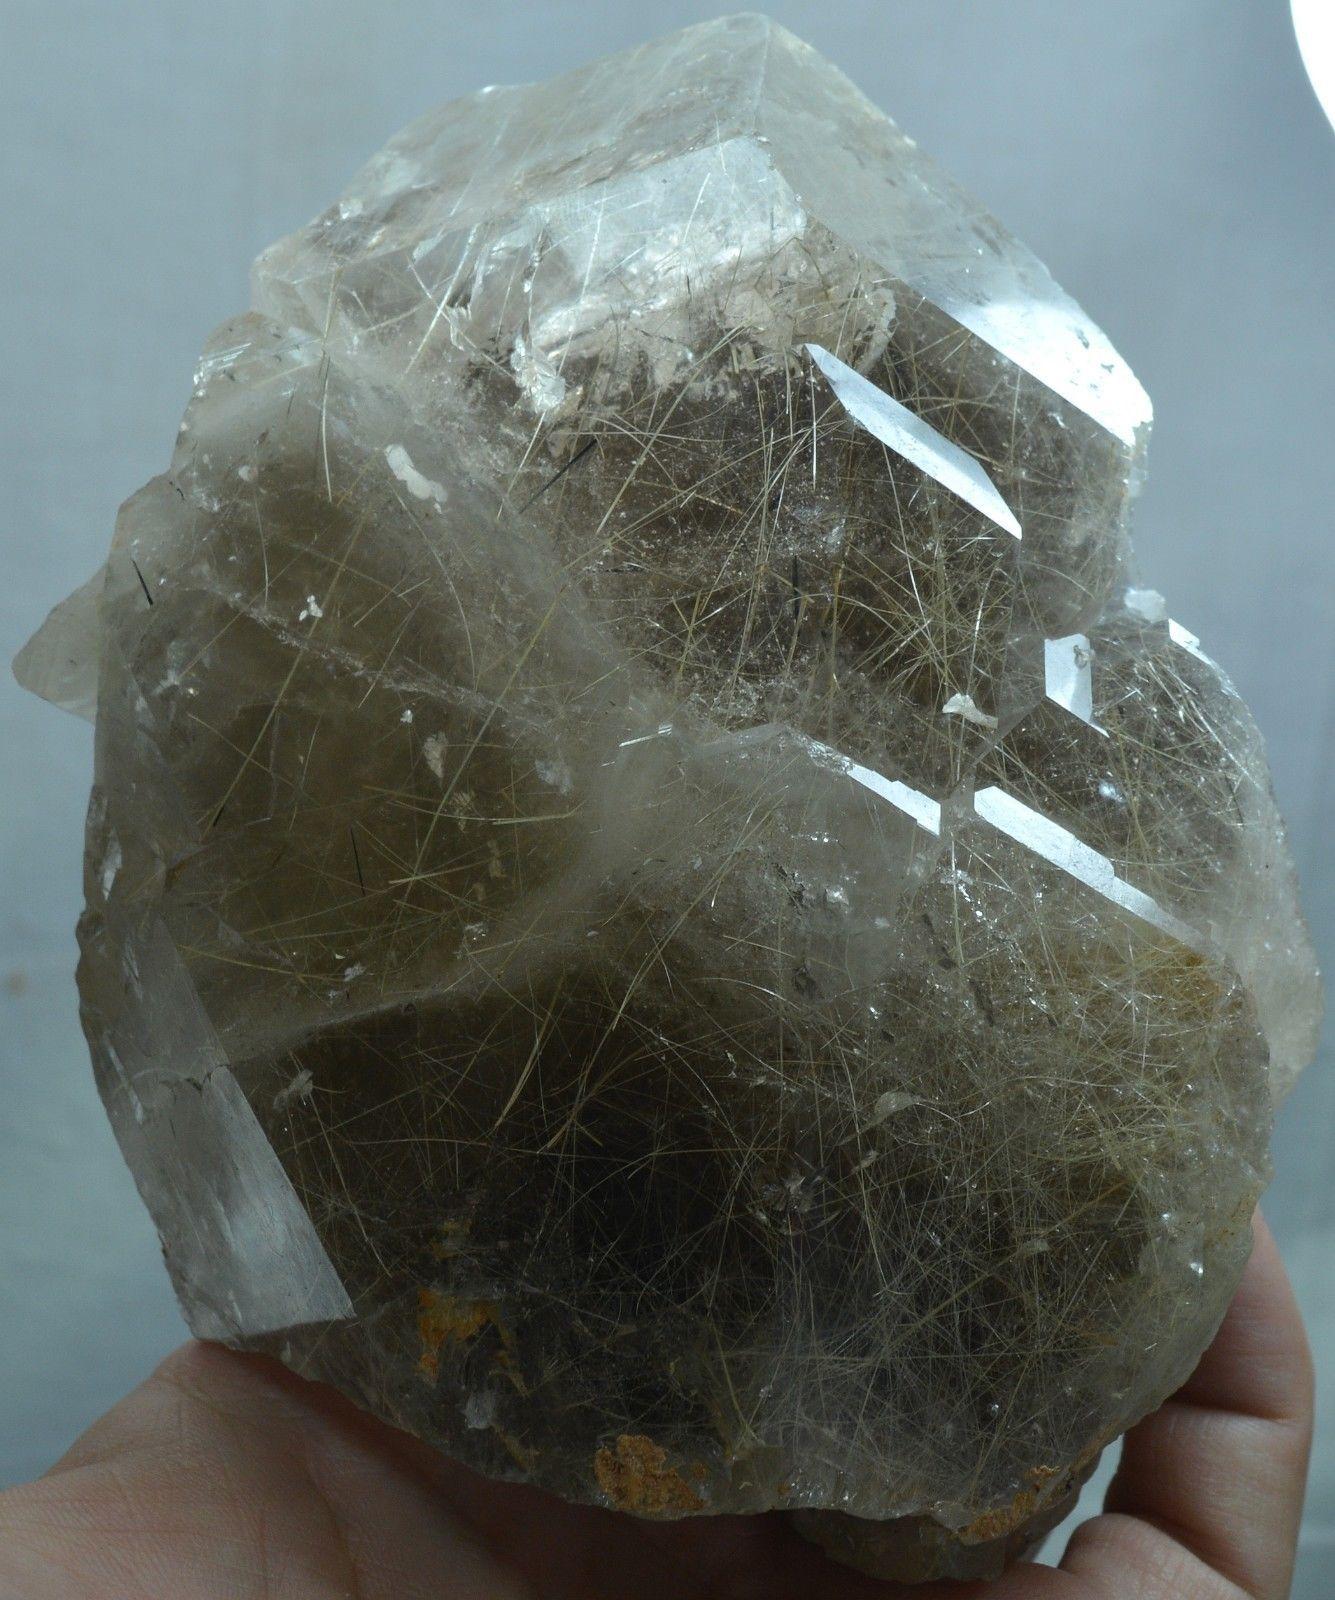 1180 Gram Terminated Rutile Inclusion Smoky Quartz Crystal From Pakistan